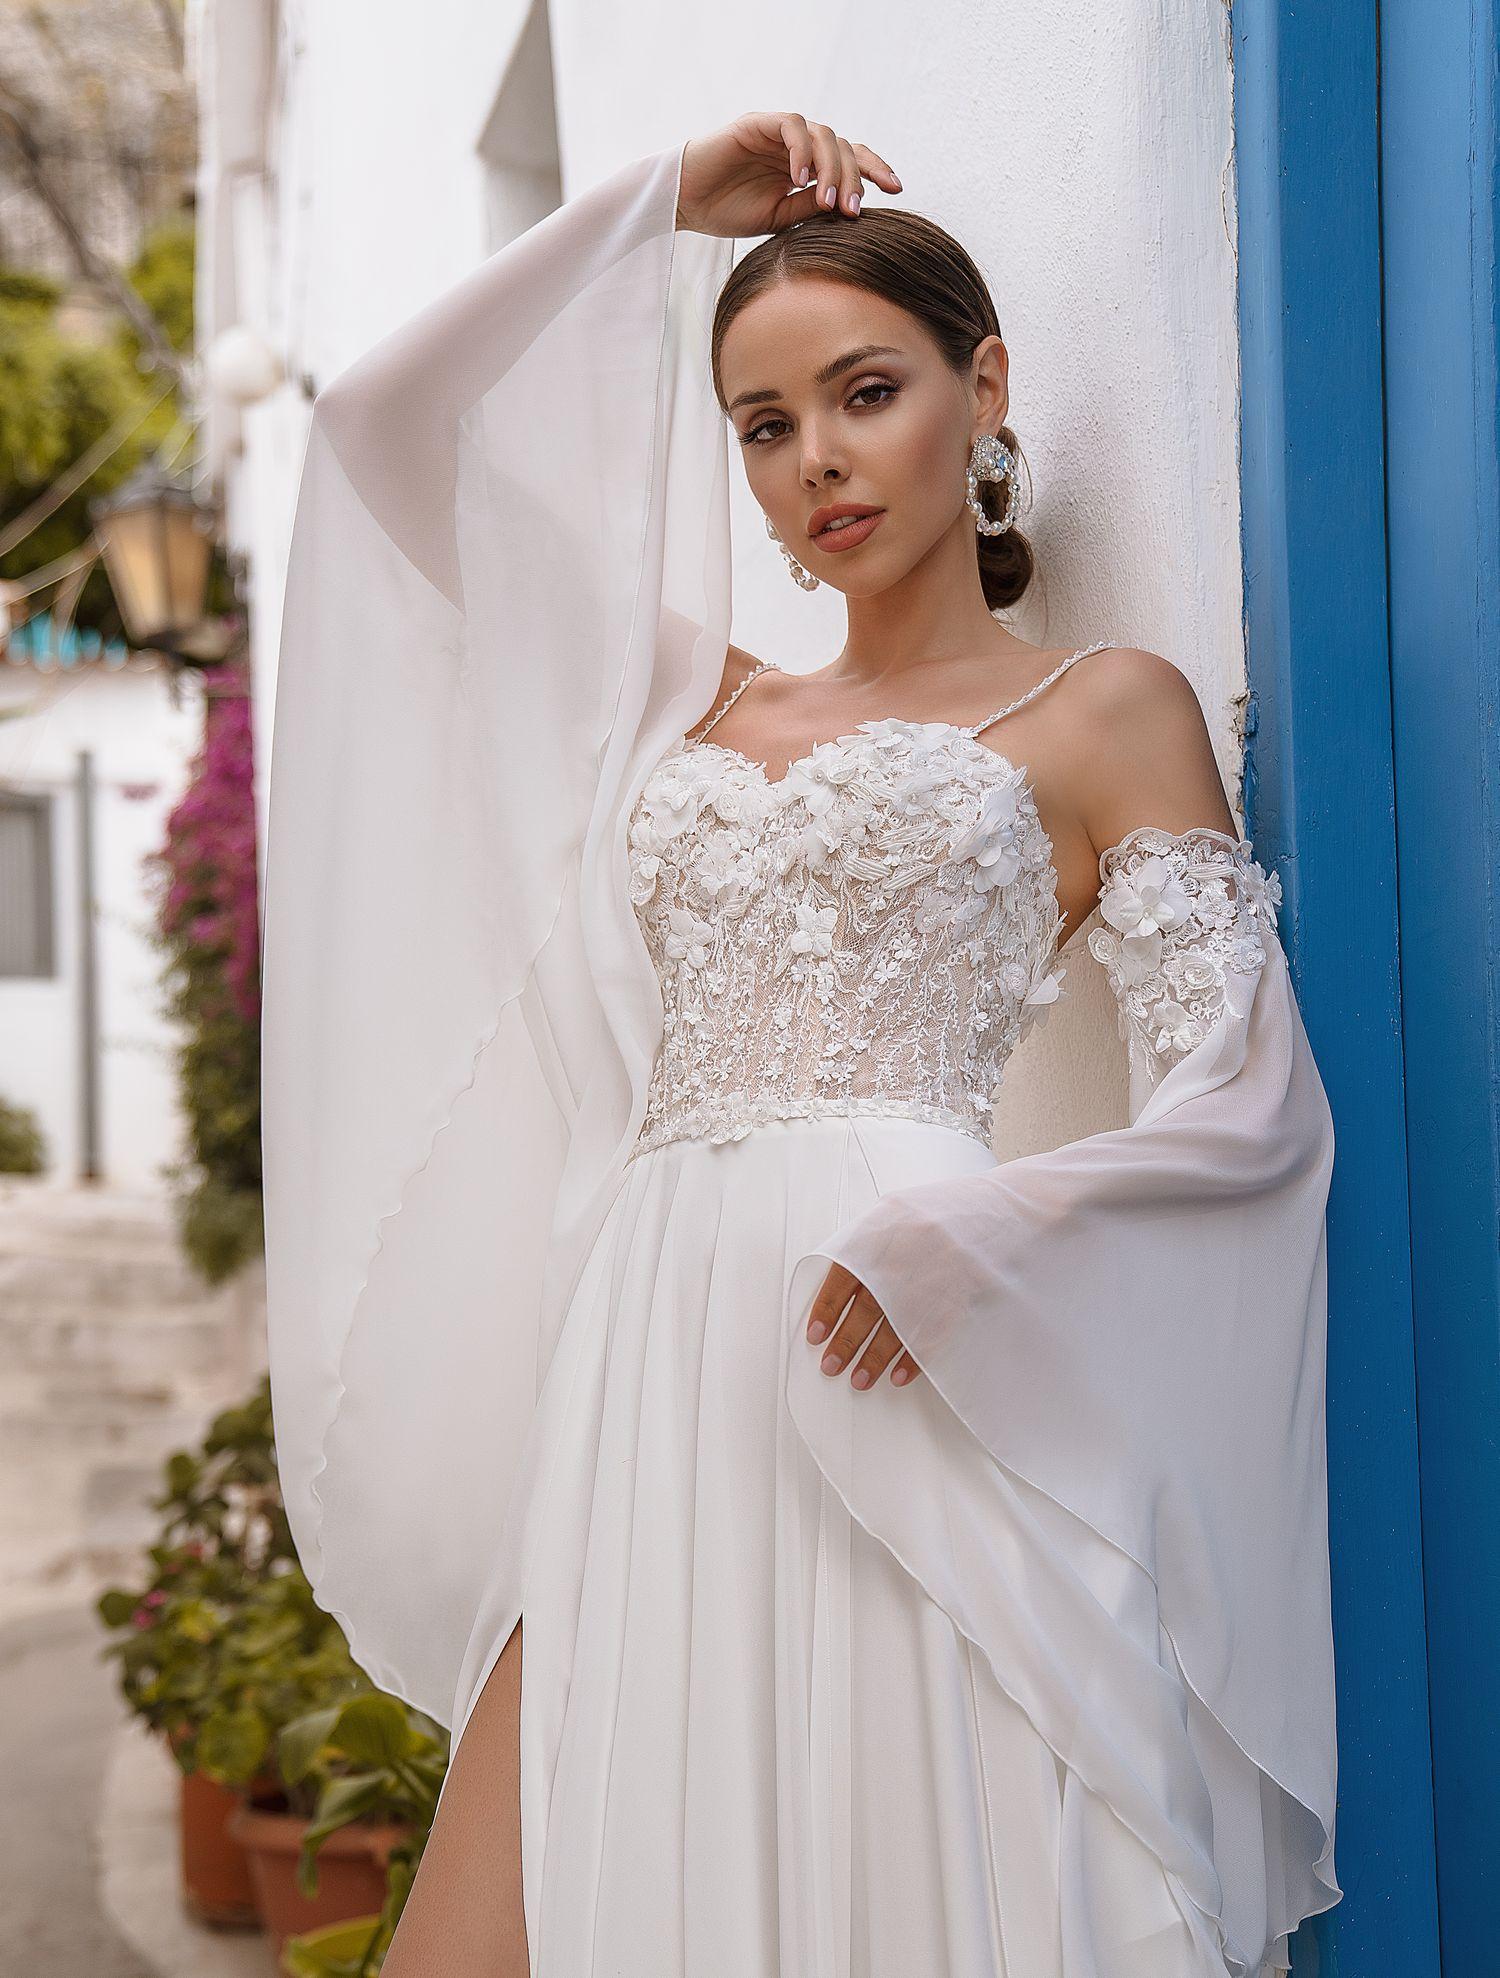 Wedding dress with belt from manufacturer Supernova wholesale-1